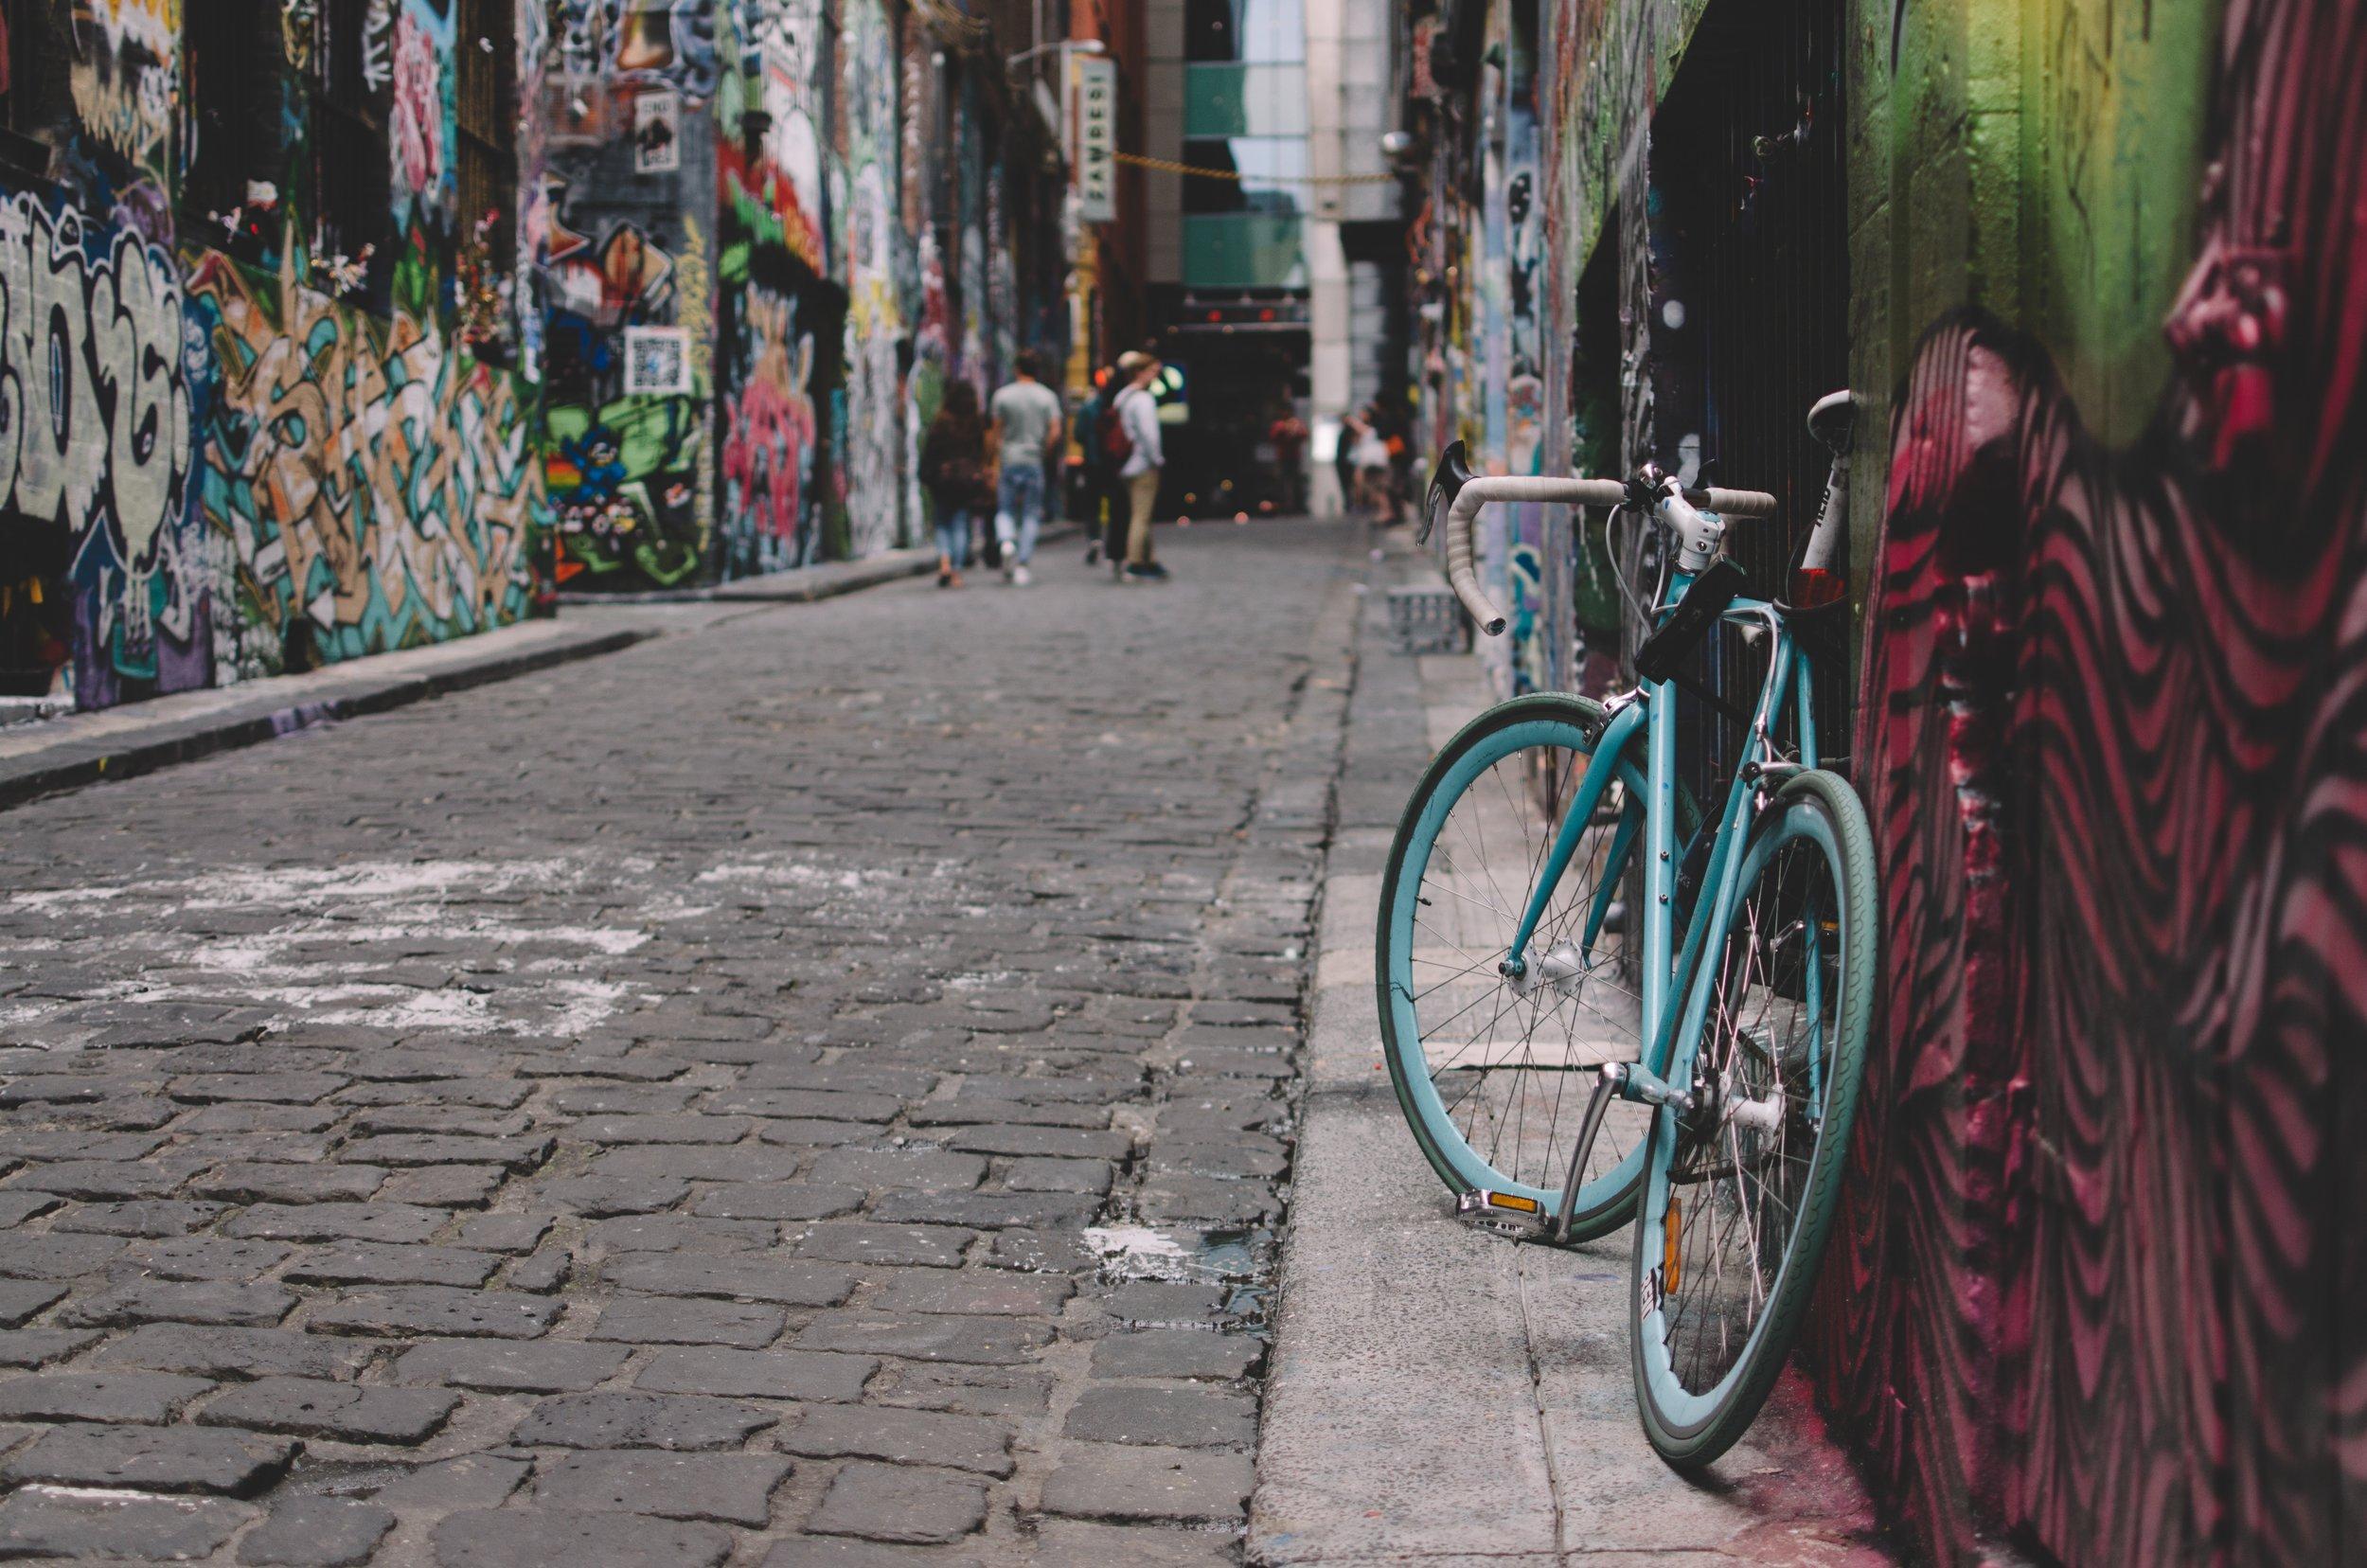 Street art and graffiti in Hosier Lane, Melbourne. Photo by Linda Xu